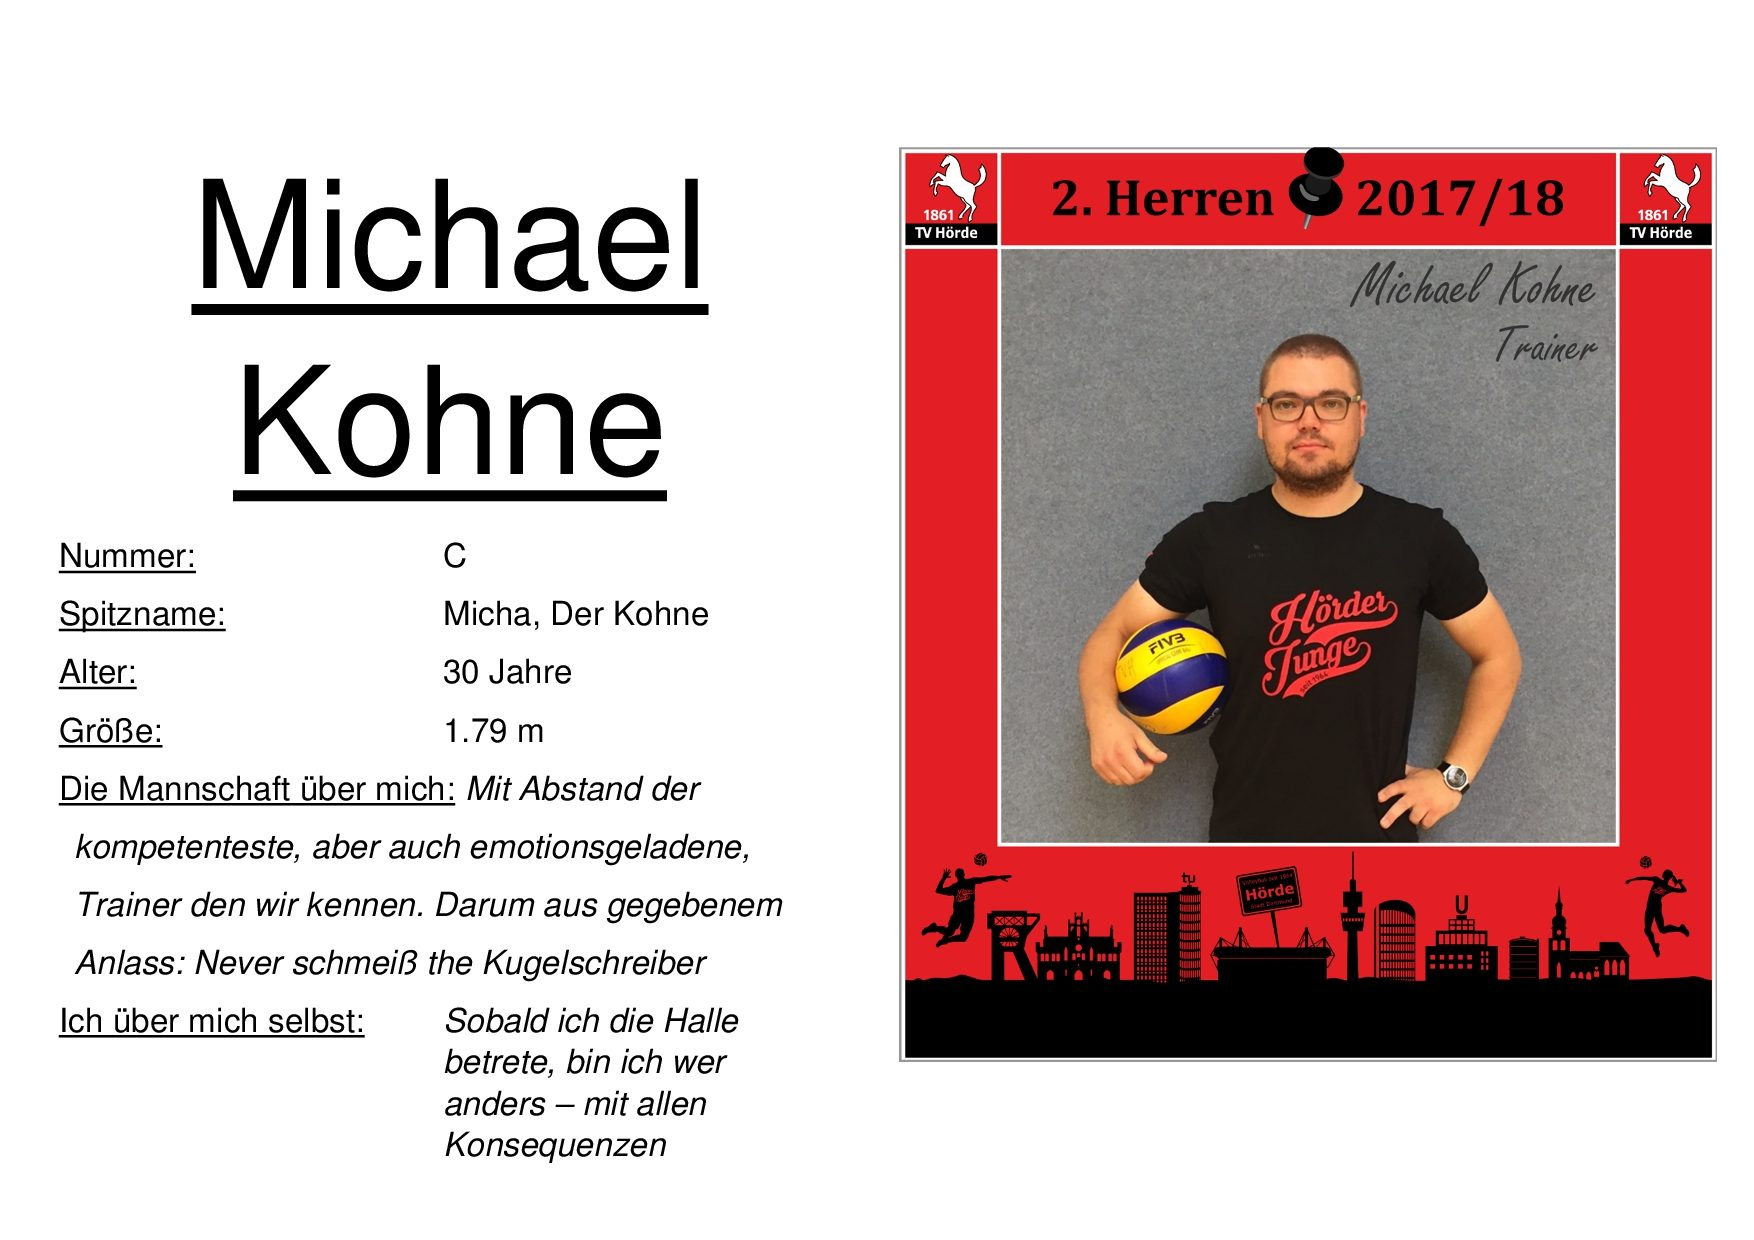 Michael Kohne